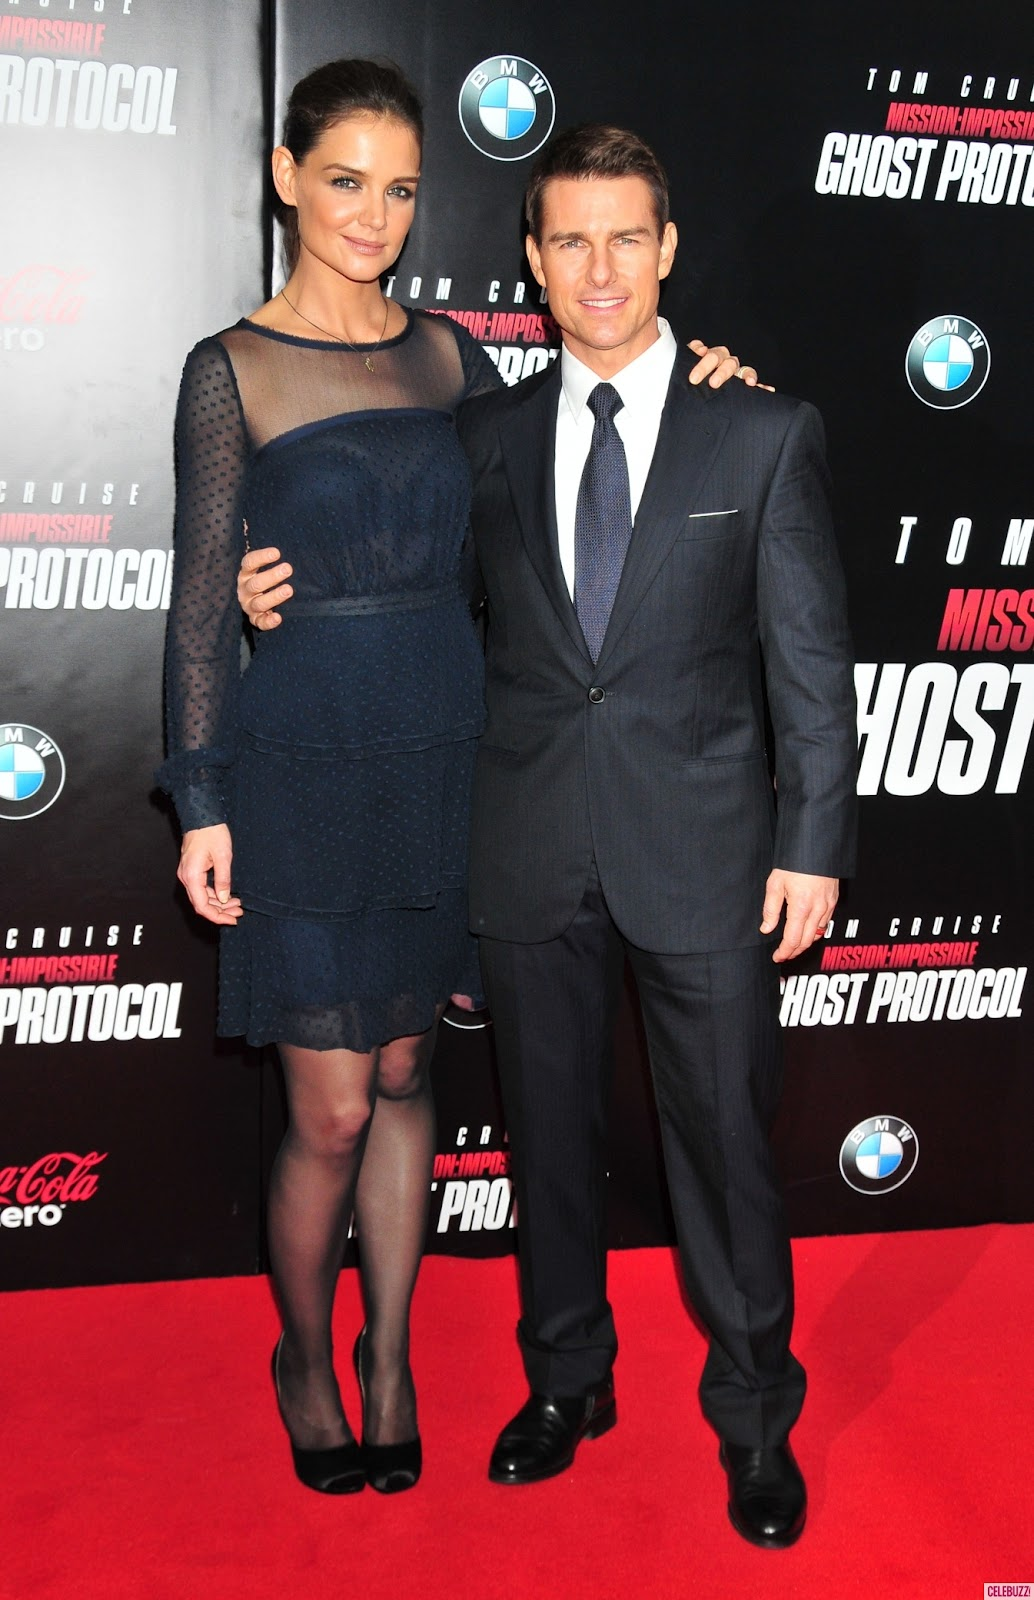 http://2.bp.blogspot.com/-kcwX5tg2E8A/T-8UcNyQRmI/AAAAAAAAAX0/nALpoCtiKak/s1600/Tom-Cruise-and-Katie-Holmes-Divorce-divorce_split_divorzio_matrimonio.jpg